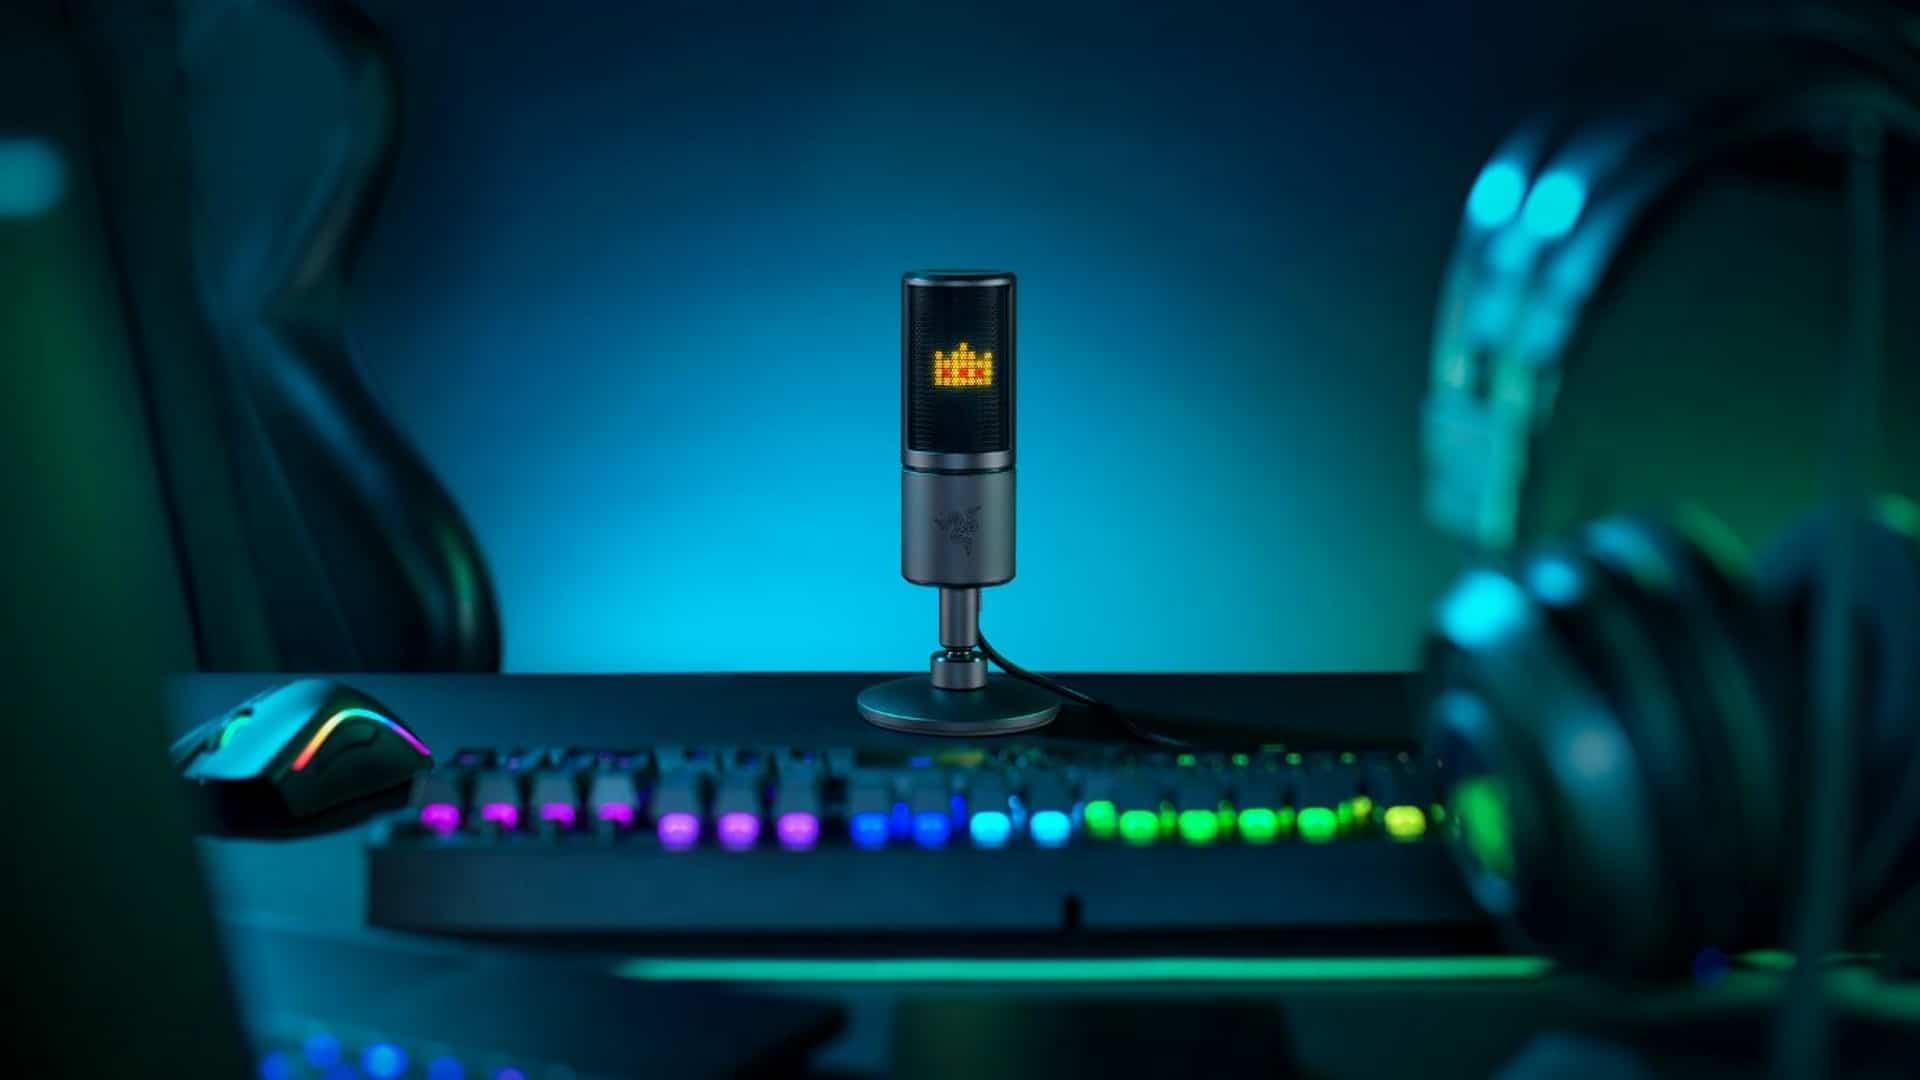 Transform Your Streams With The Razer Seiren Emote